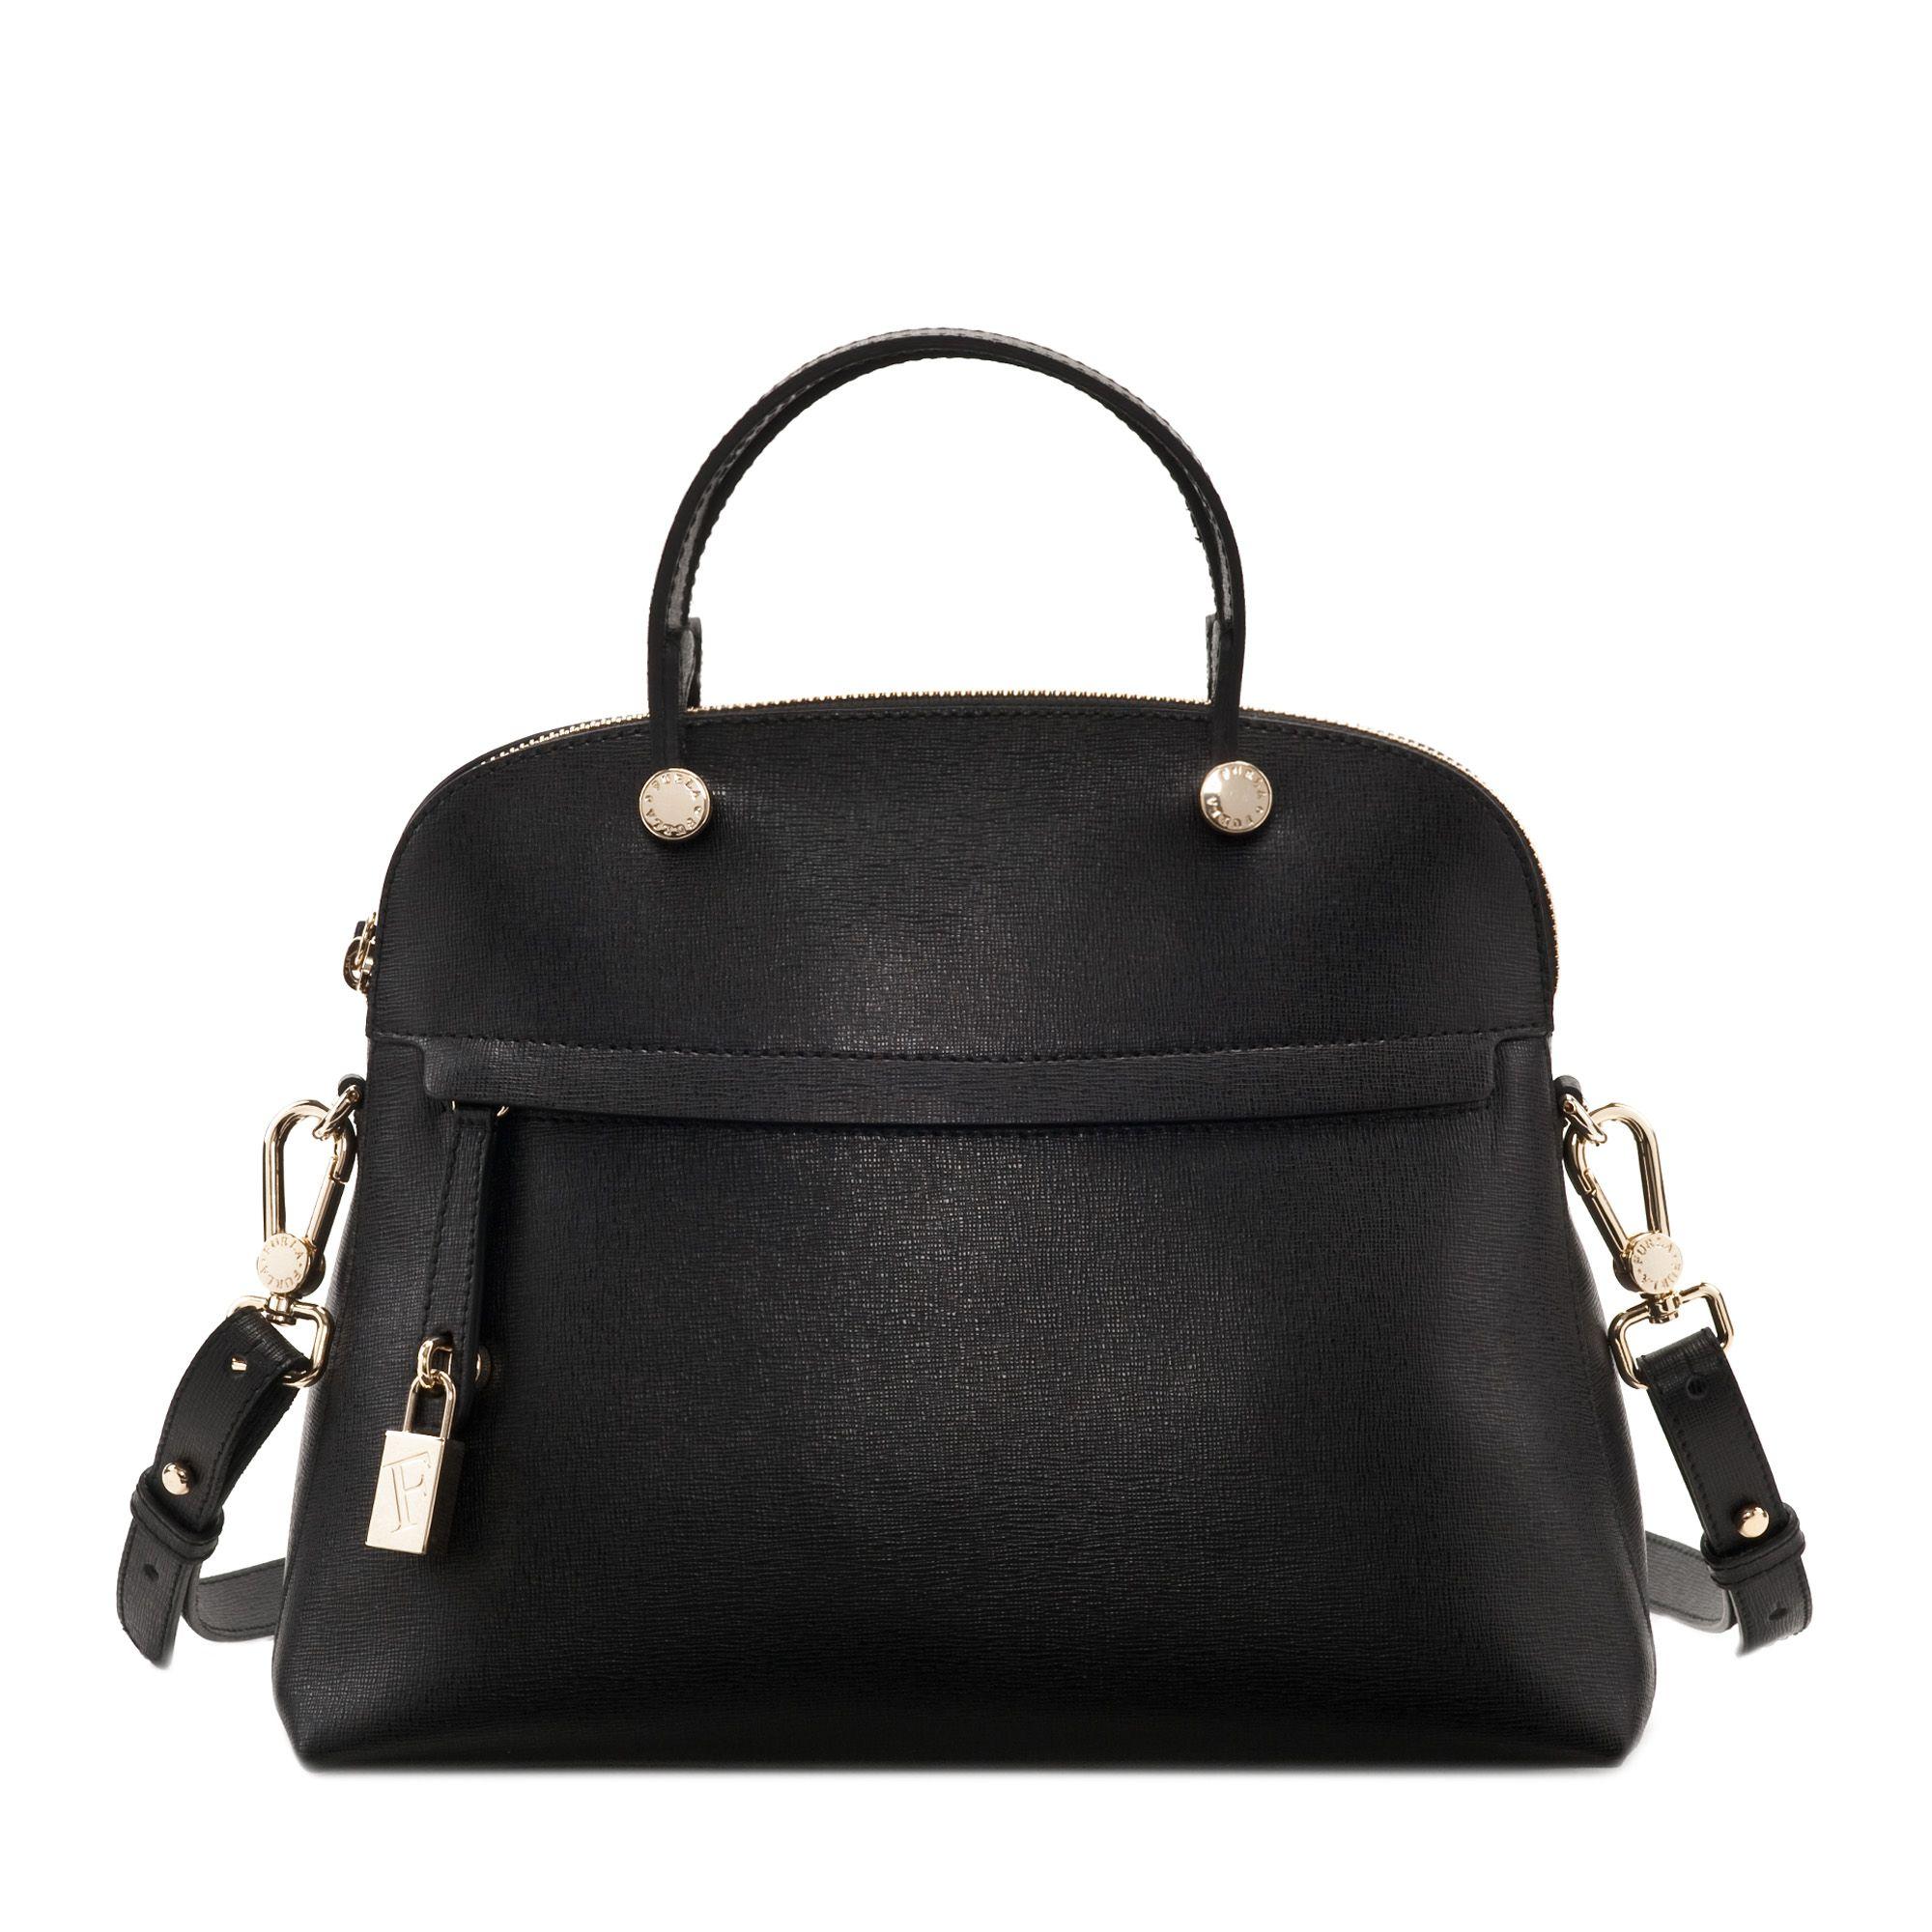 Furla Bag Piper Tote - Black Summer 2013 Collection